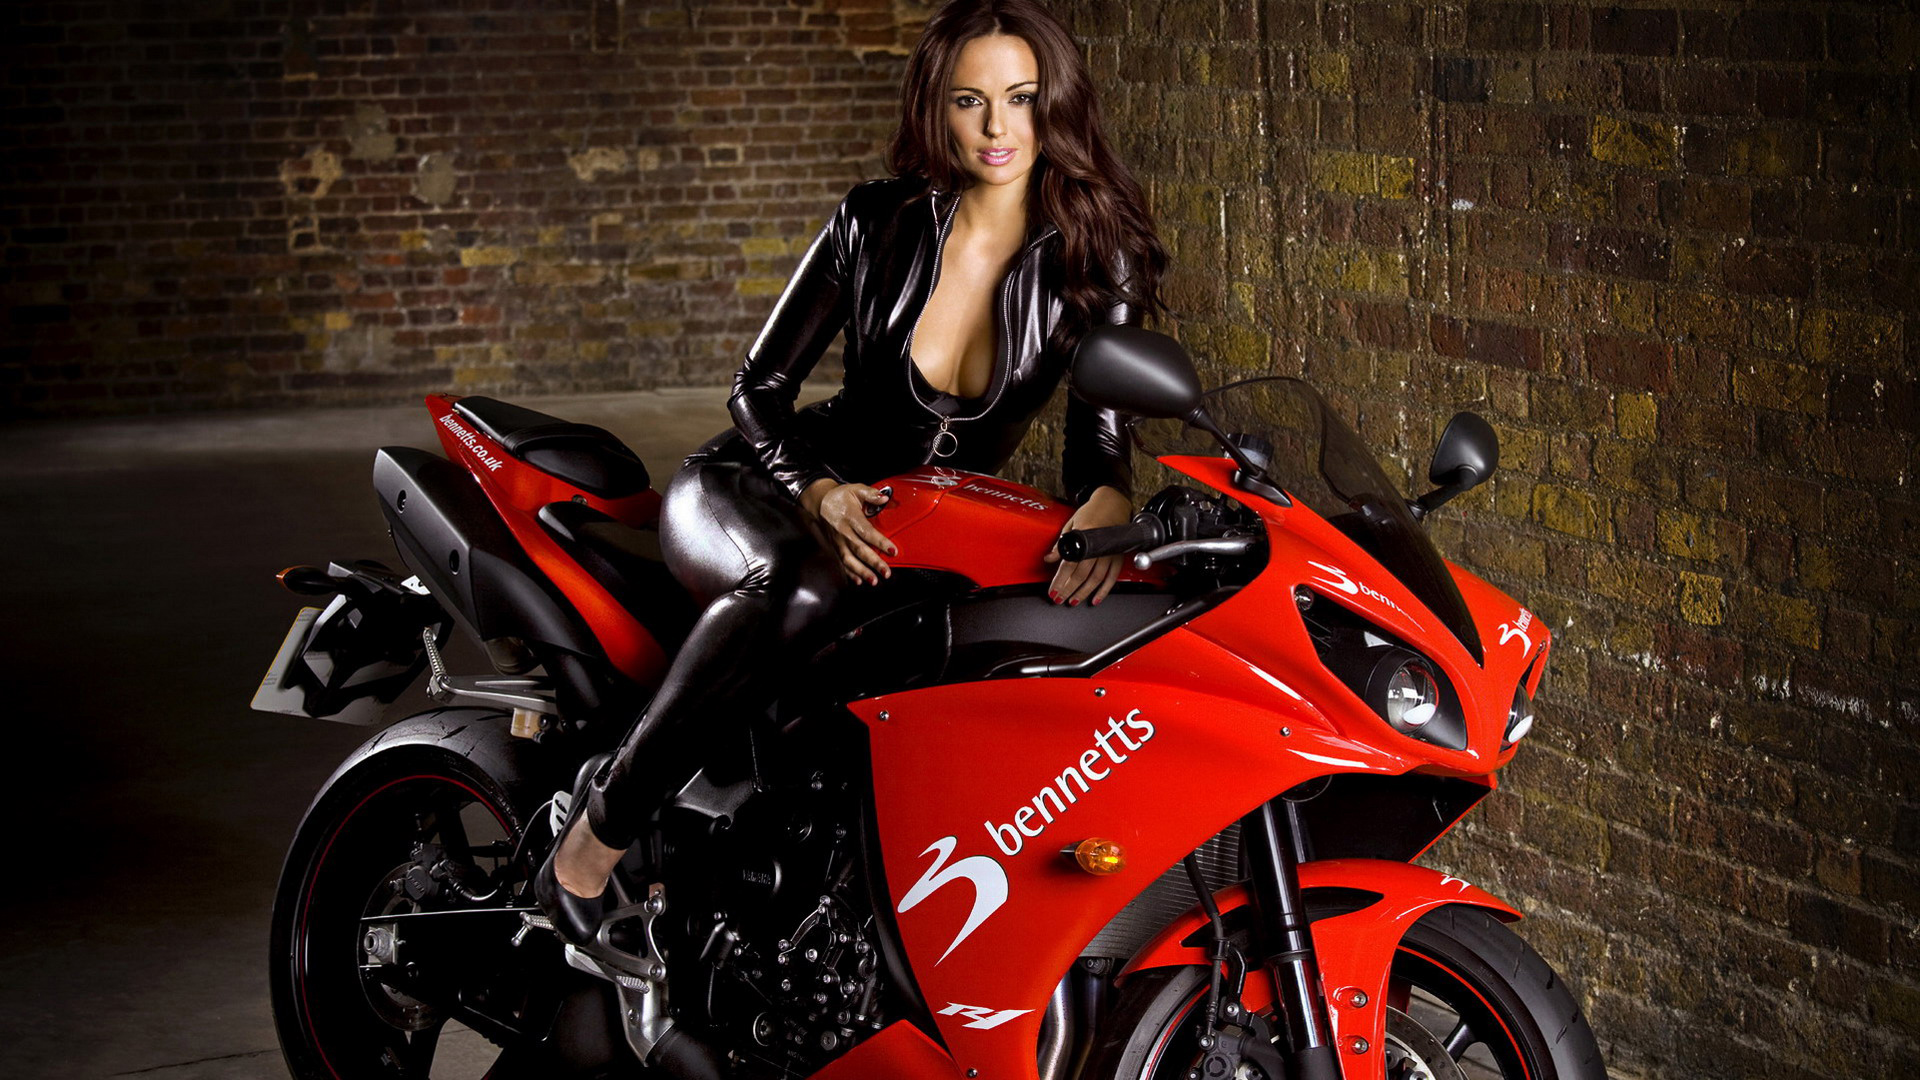 Indian Motorcycle Orange County >> Chopper Girls Motorcycle Wallpaper - WallpaperSafari